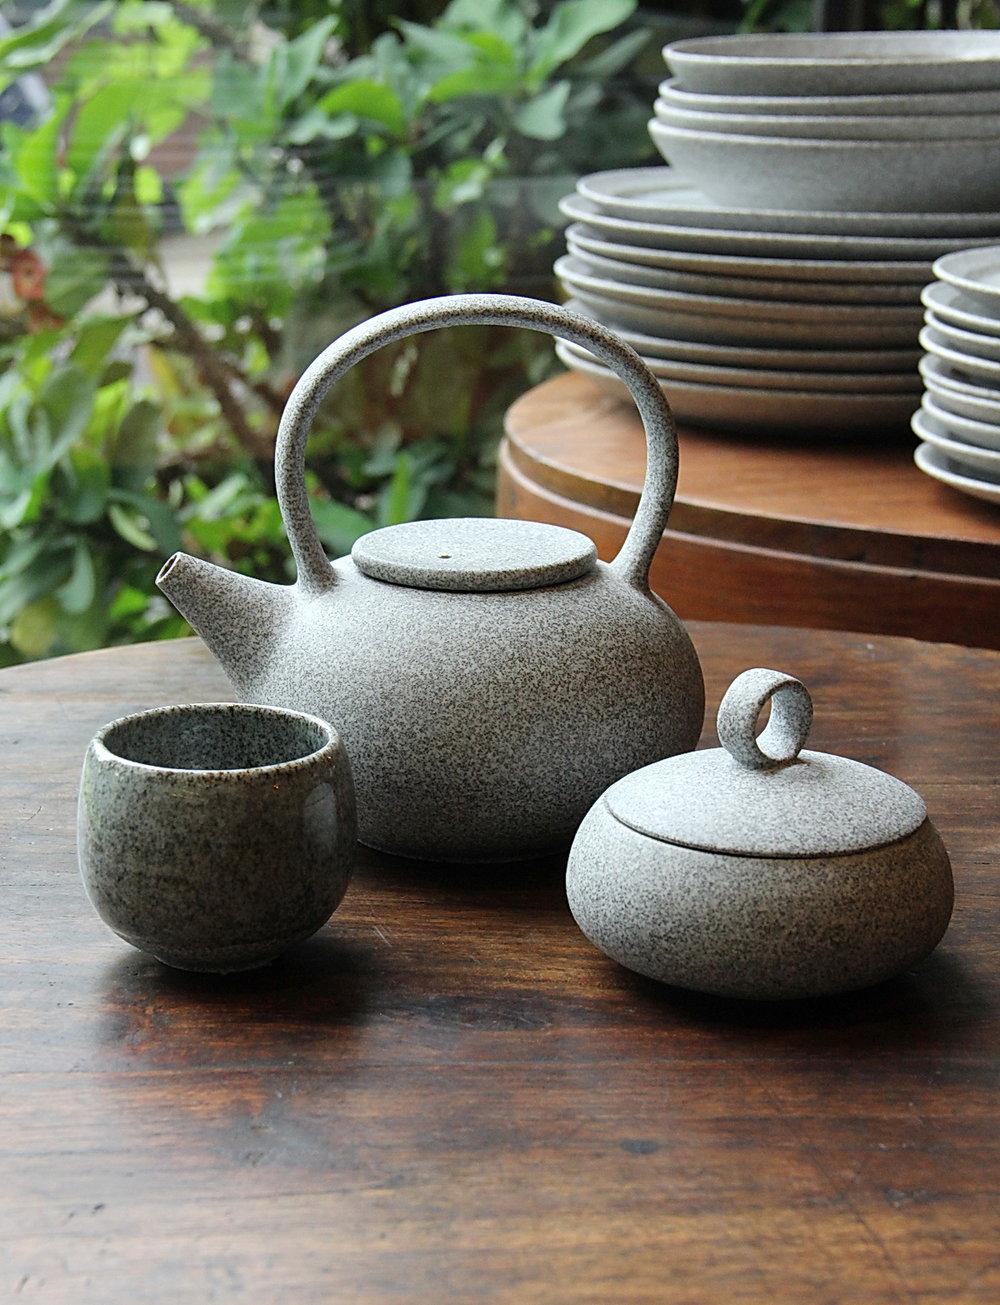 sandy tea set collection.JPG